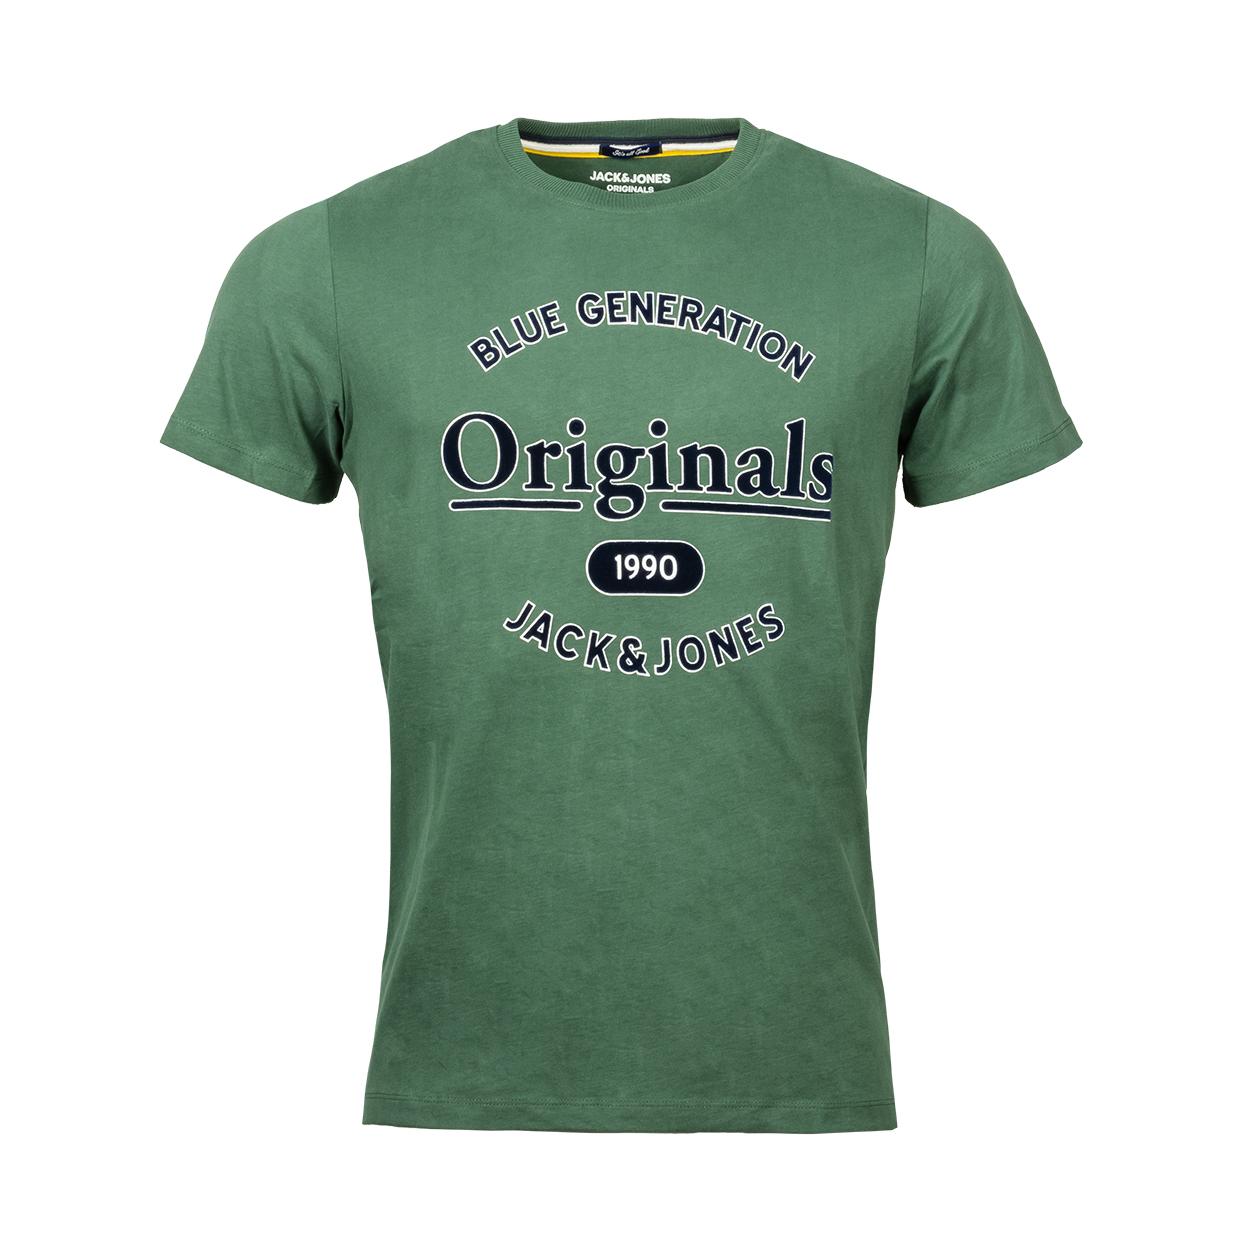 Tee-shirt col rond  jorlars en coton vert bouteille floqué